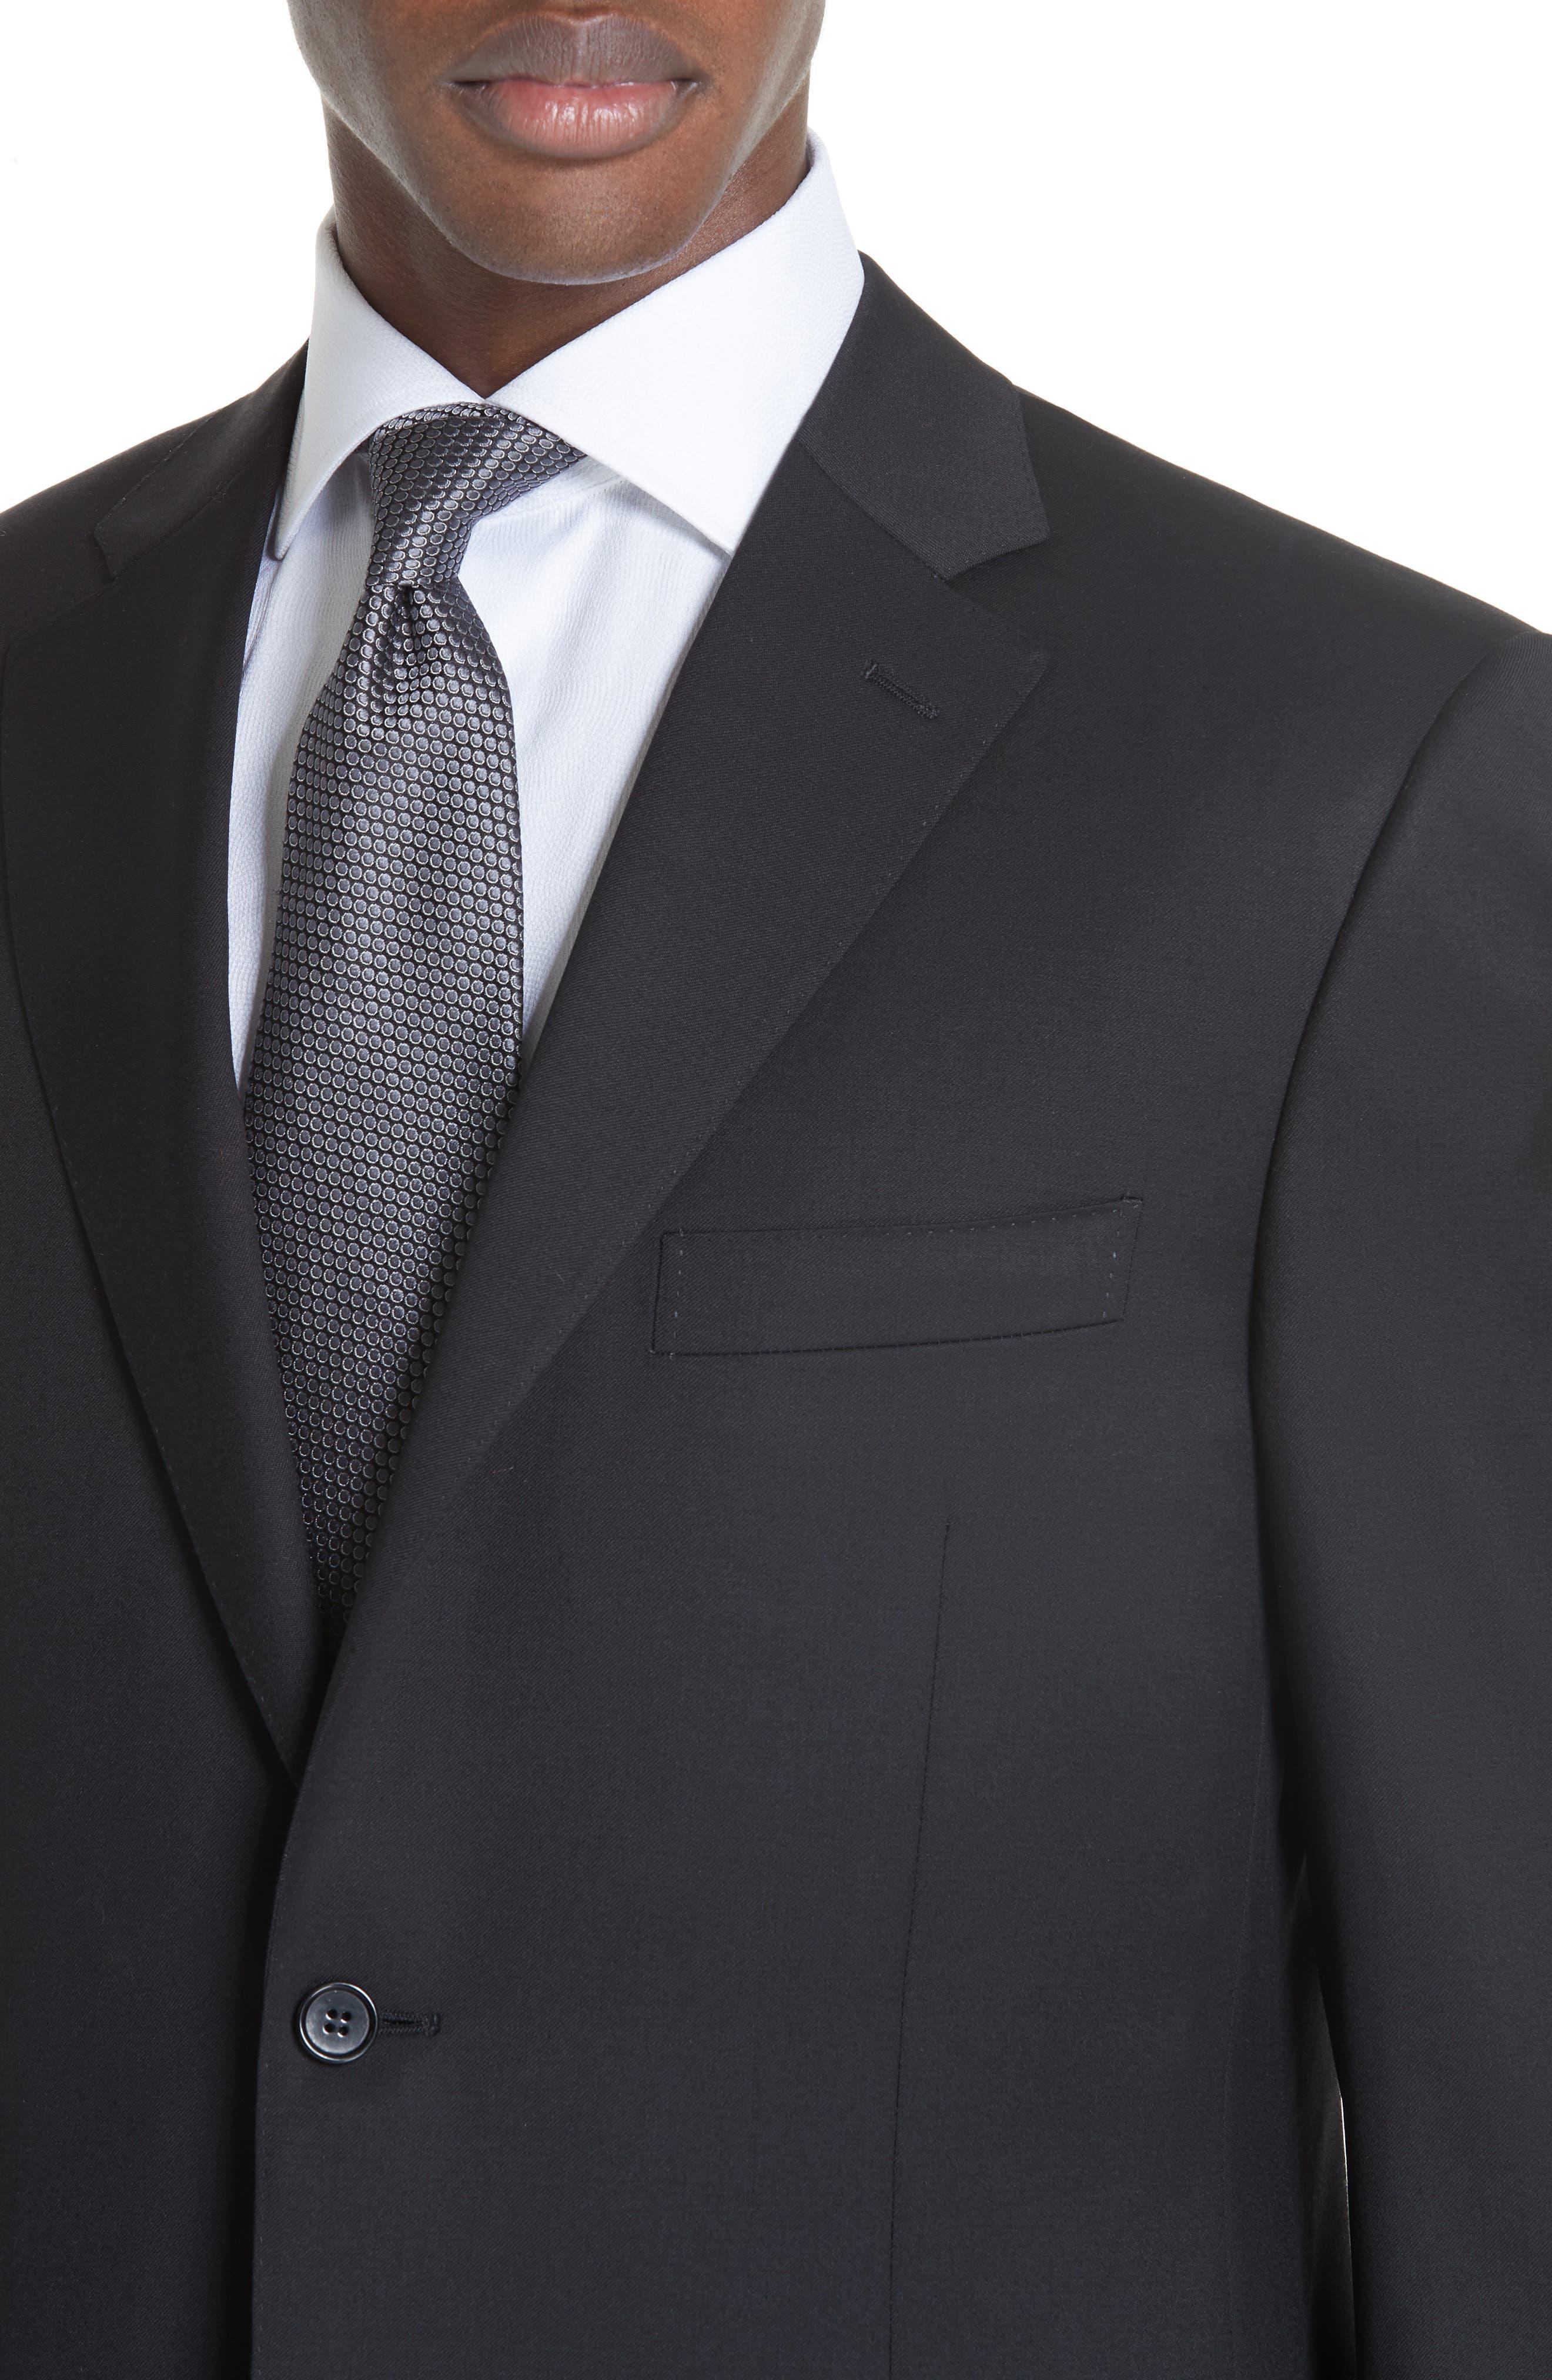 Classic Fit Solid Wool Suit,                             Alternate thumbnail 4, color,                             BLACK